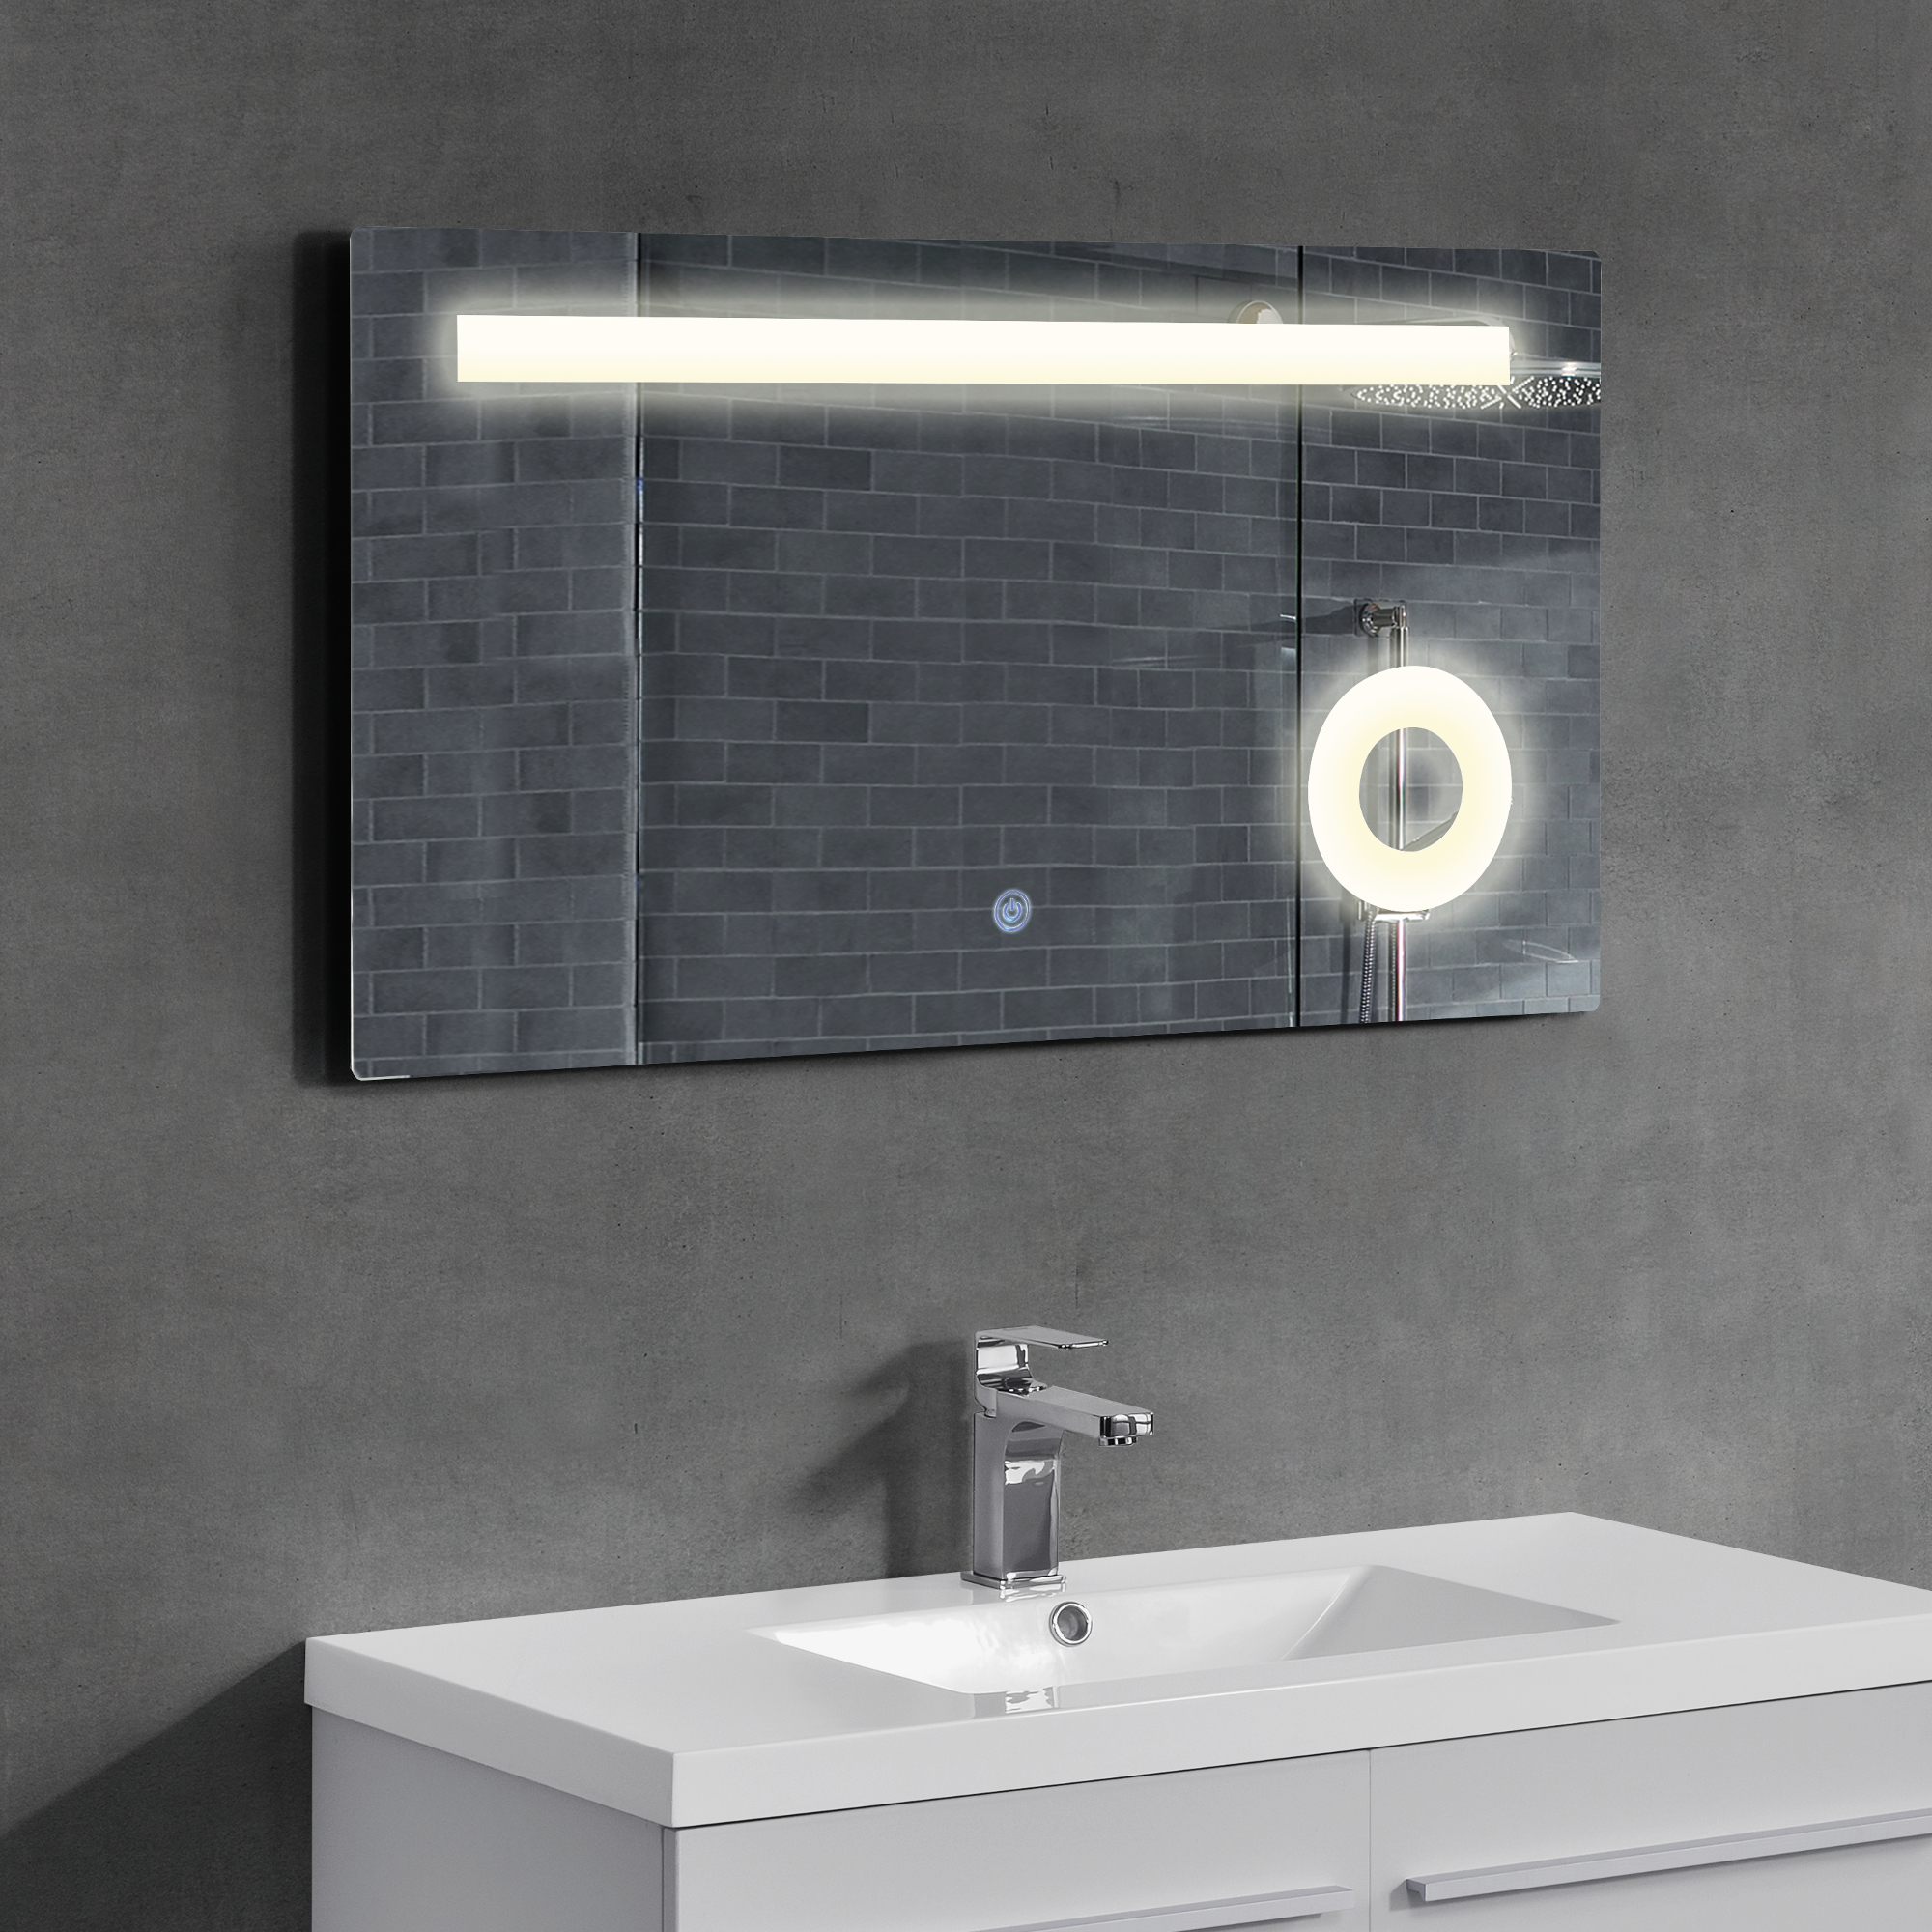 Neuhaus led miroir de la salle bain mural cosm tique 50 for Miroir salle de bain 90 x 90